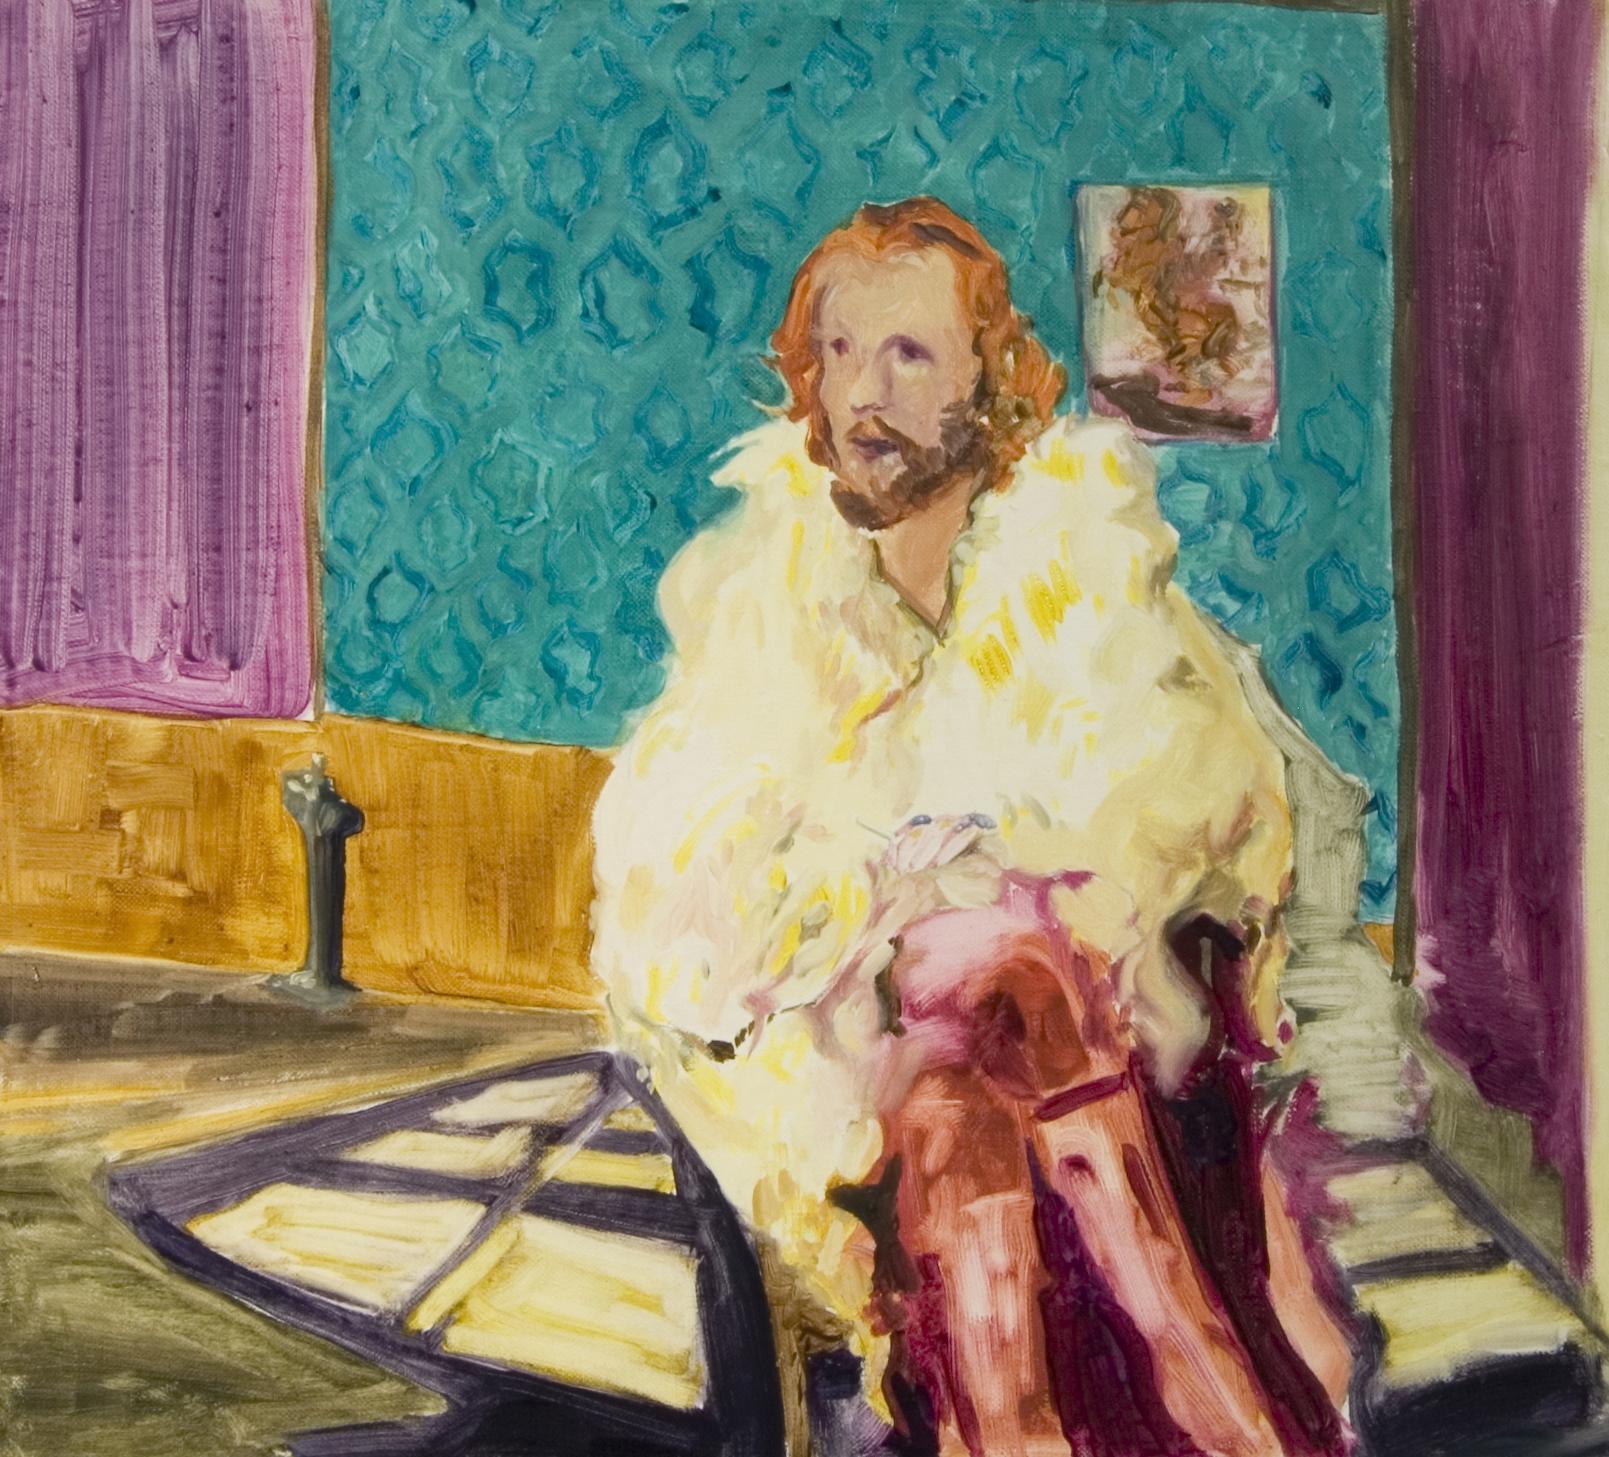 Fur Coat: Prince Colors